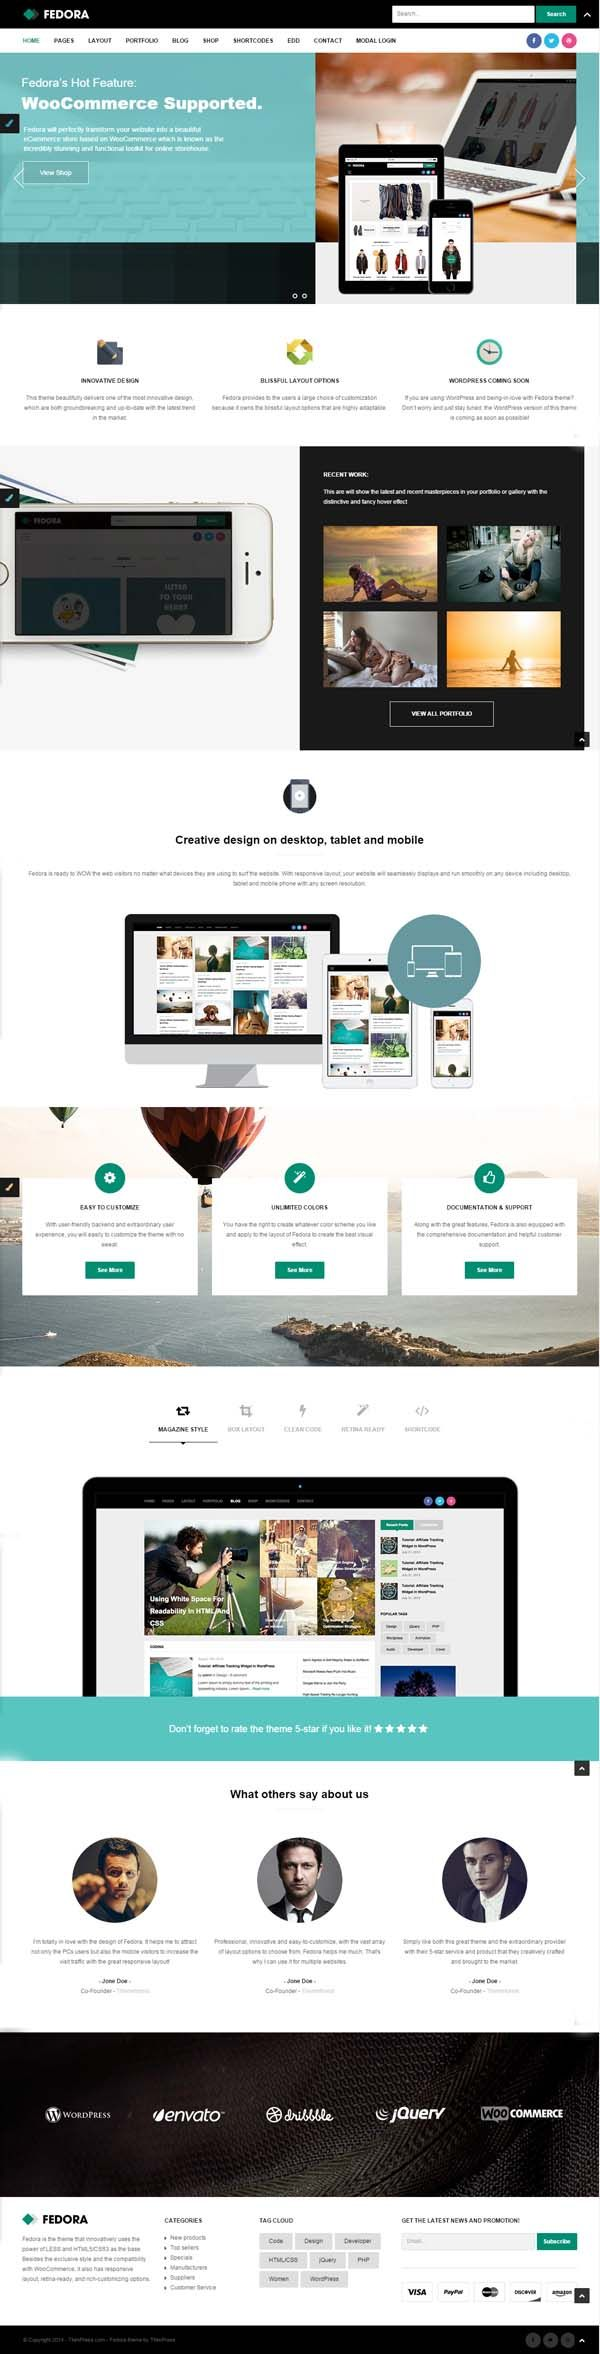 The 53 best Flat Design Website Templates images on Pinterest | Flat ...